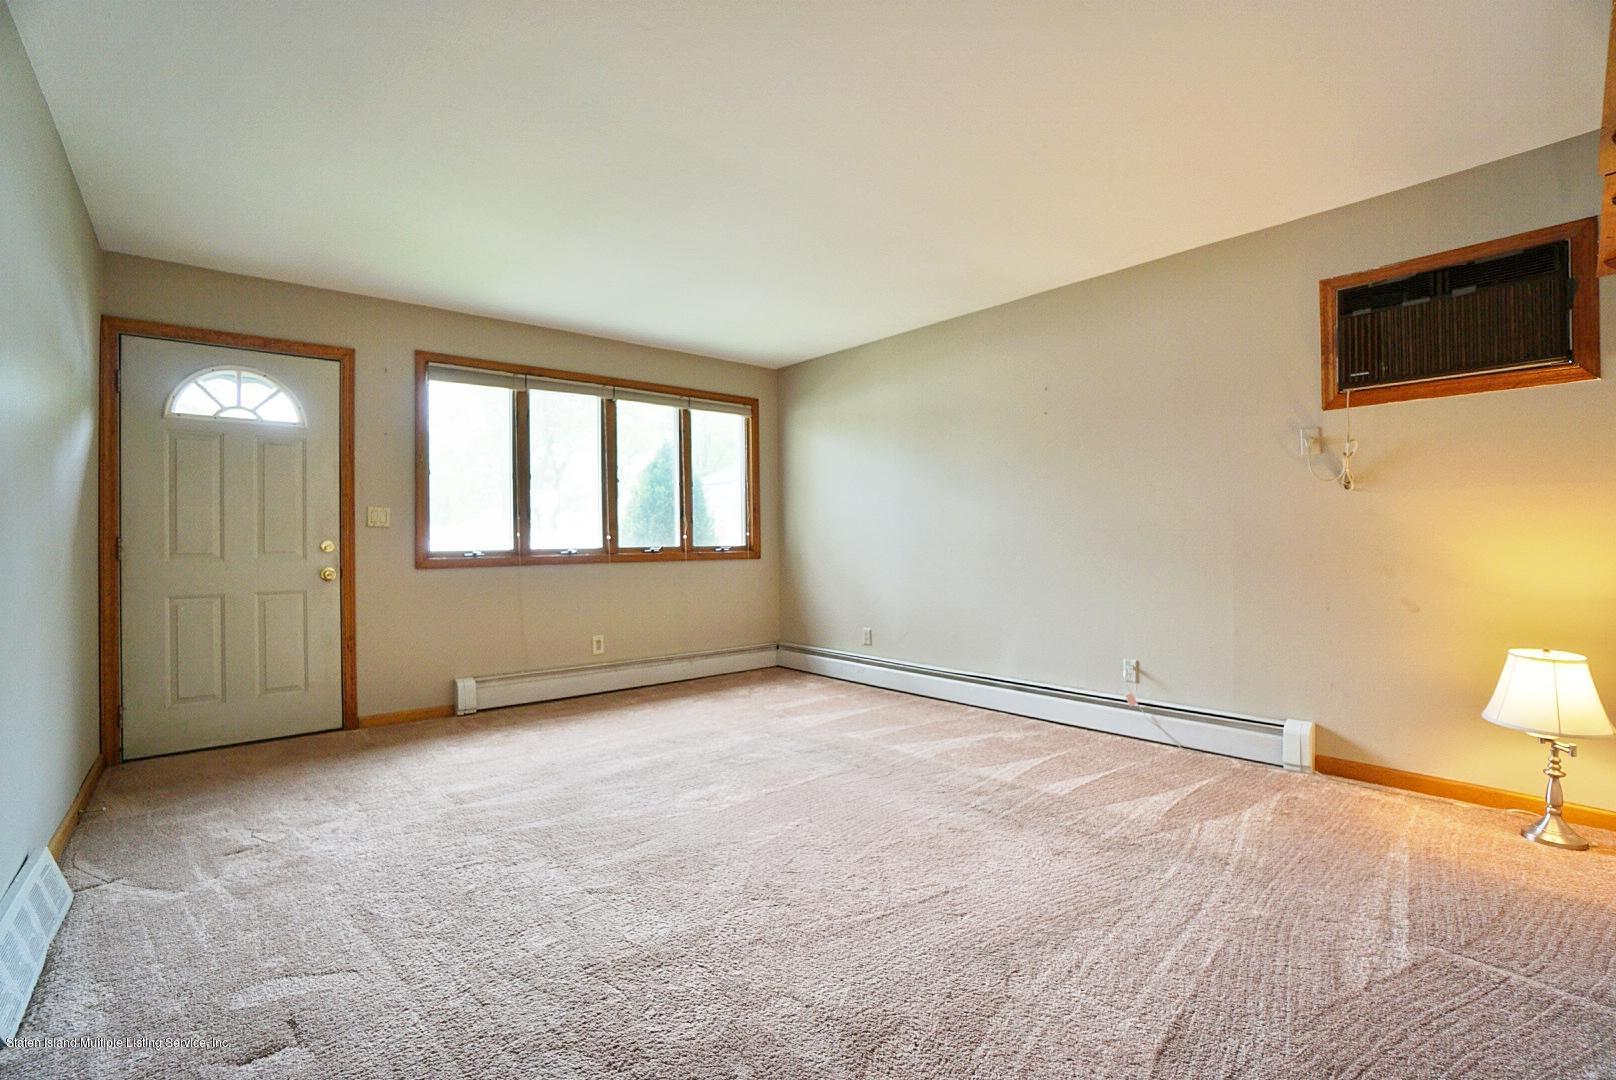 Single Family - Detached 55 Lyndale Avenue  Staten Island, NY 10312, MLS-1128769-11